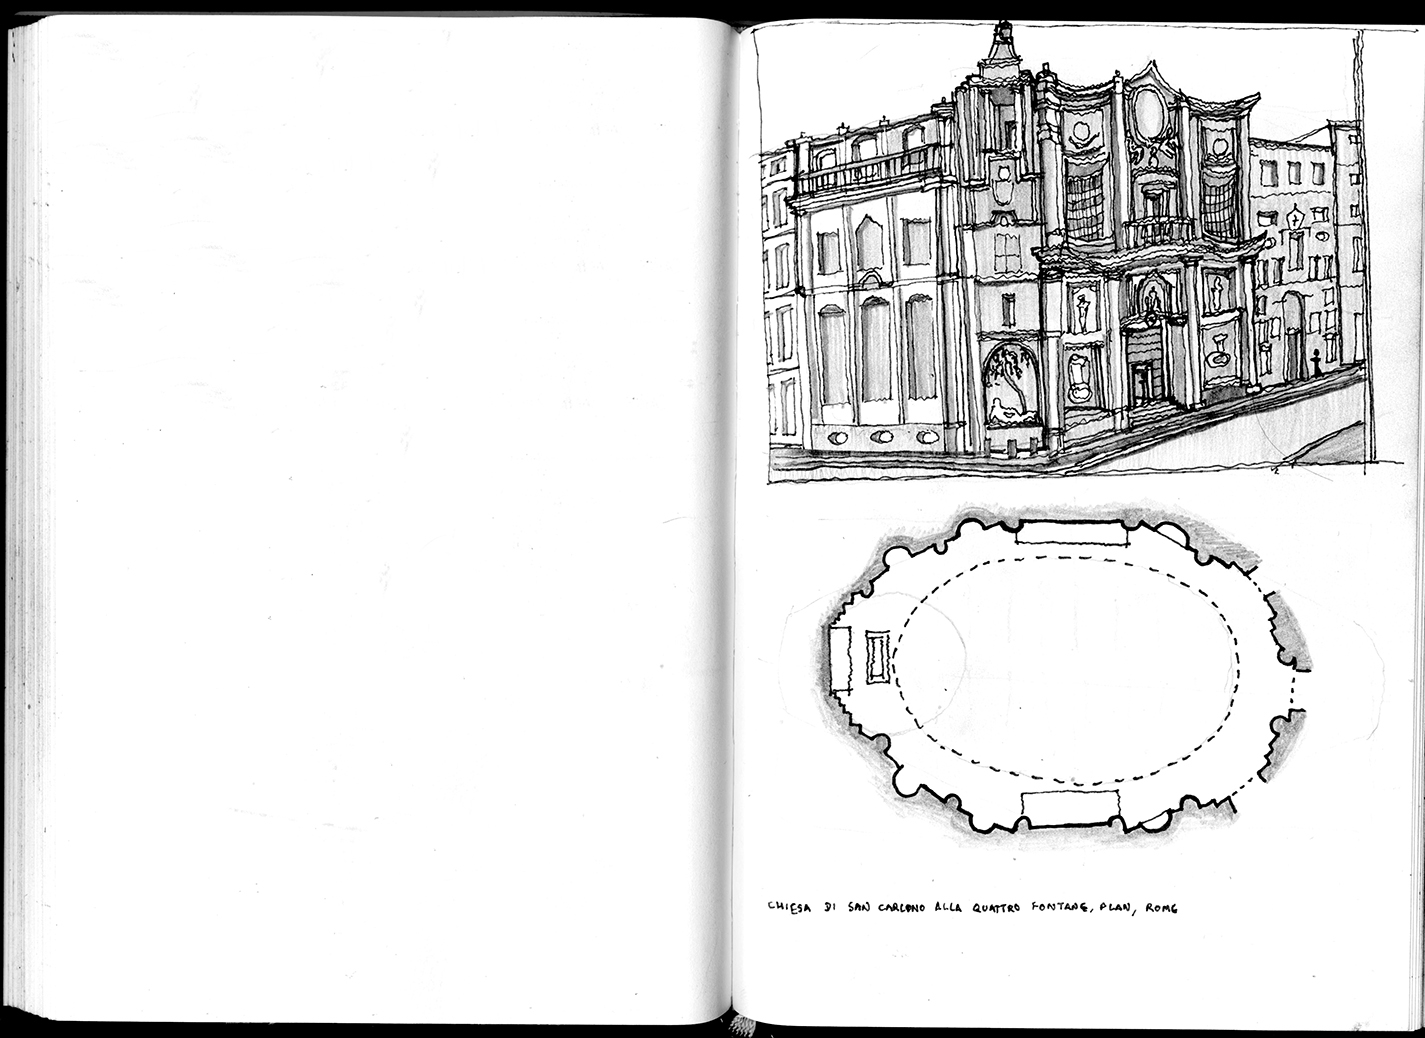 151115_San-carlo-alla-quattro-fontane_WEB.jpg